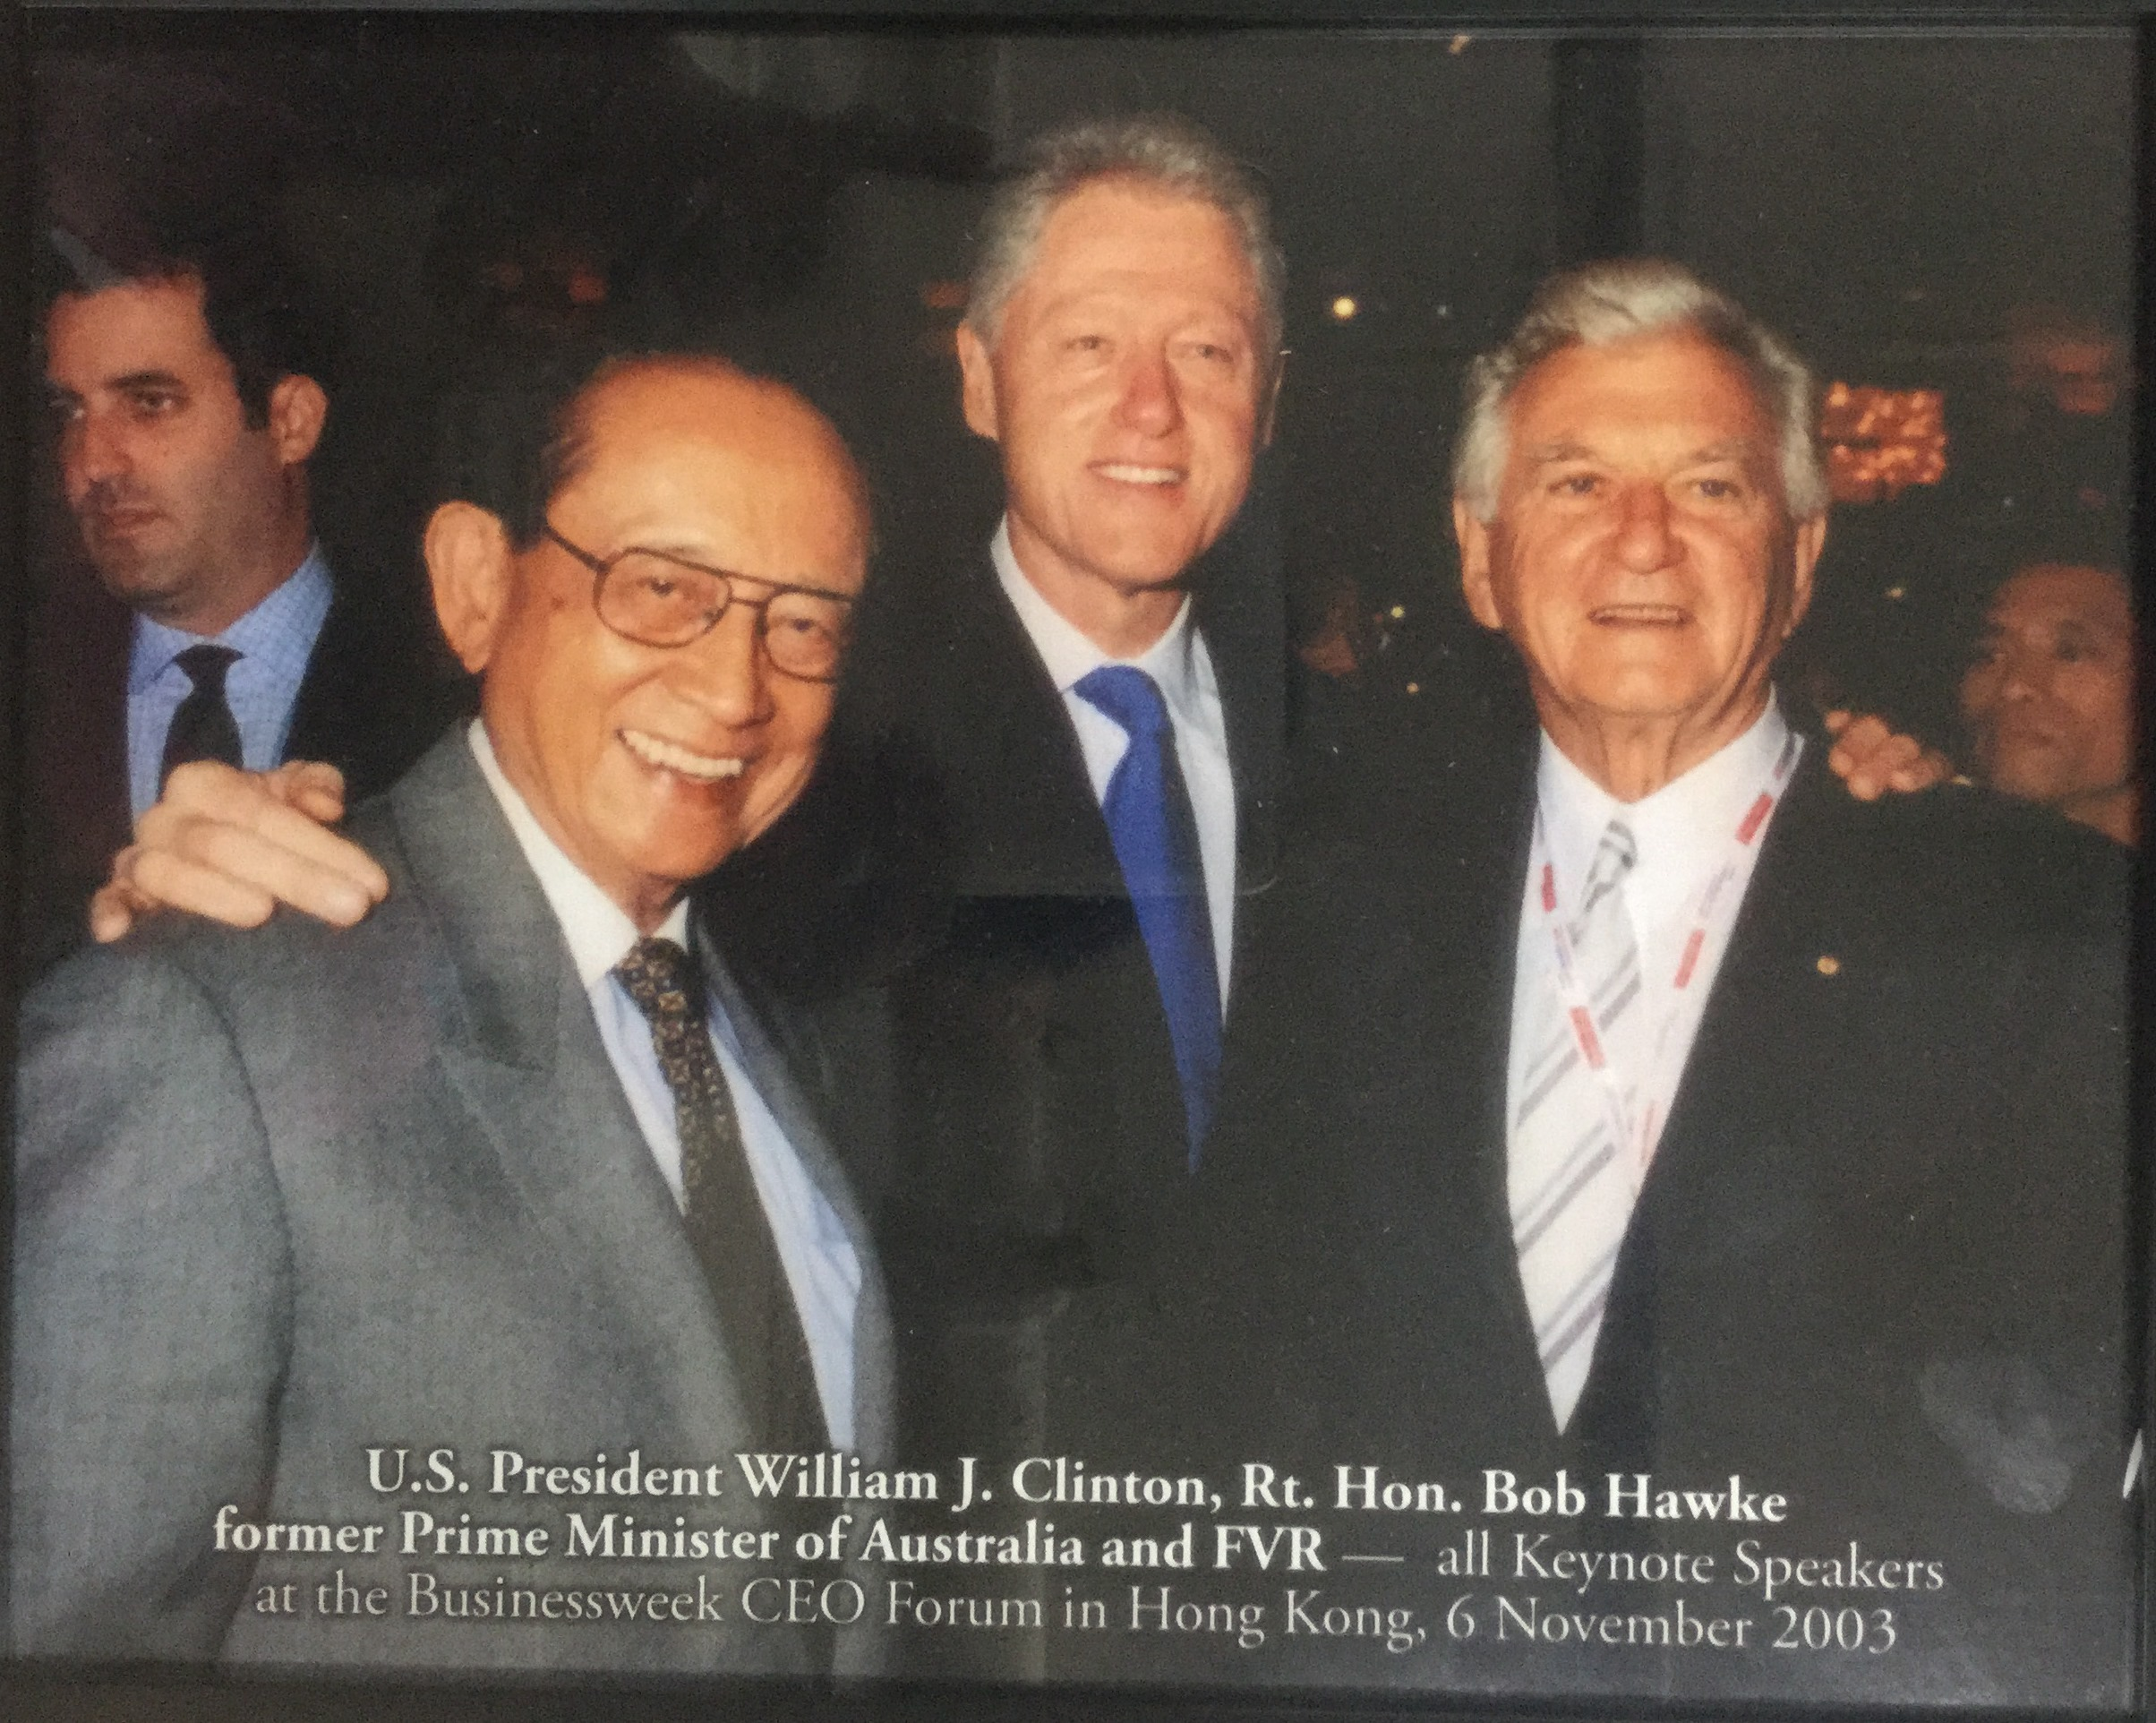 U.S President William J. Clinton, Rt. Hon. Bob Hawke former Prime Minister of Australia and FVR